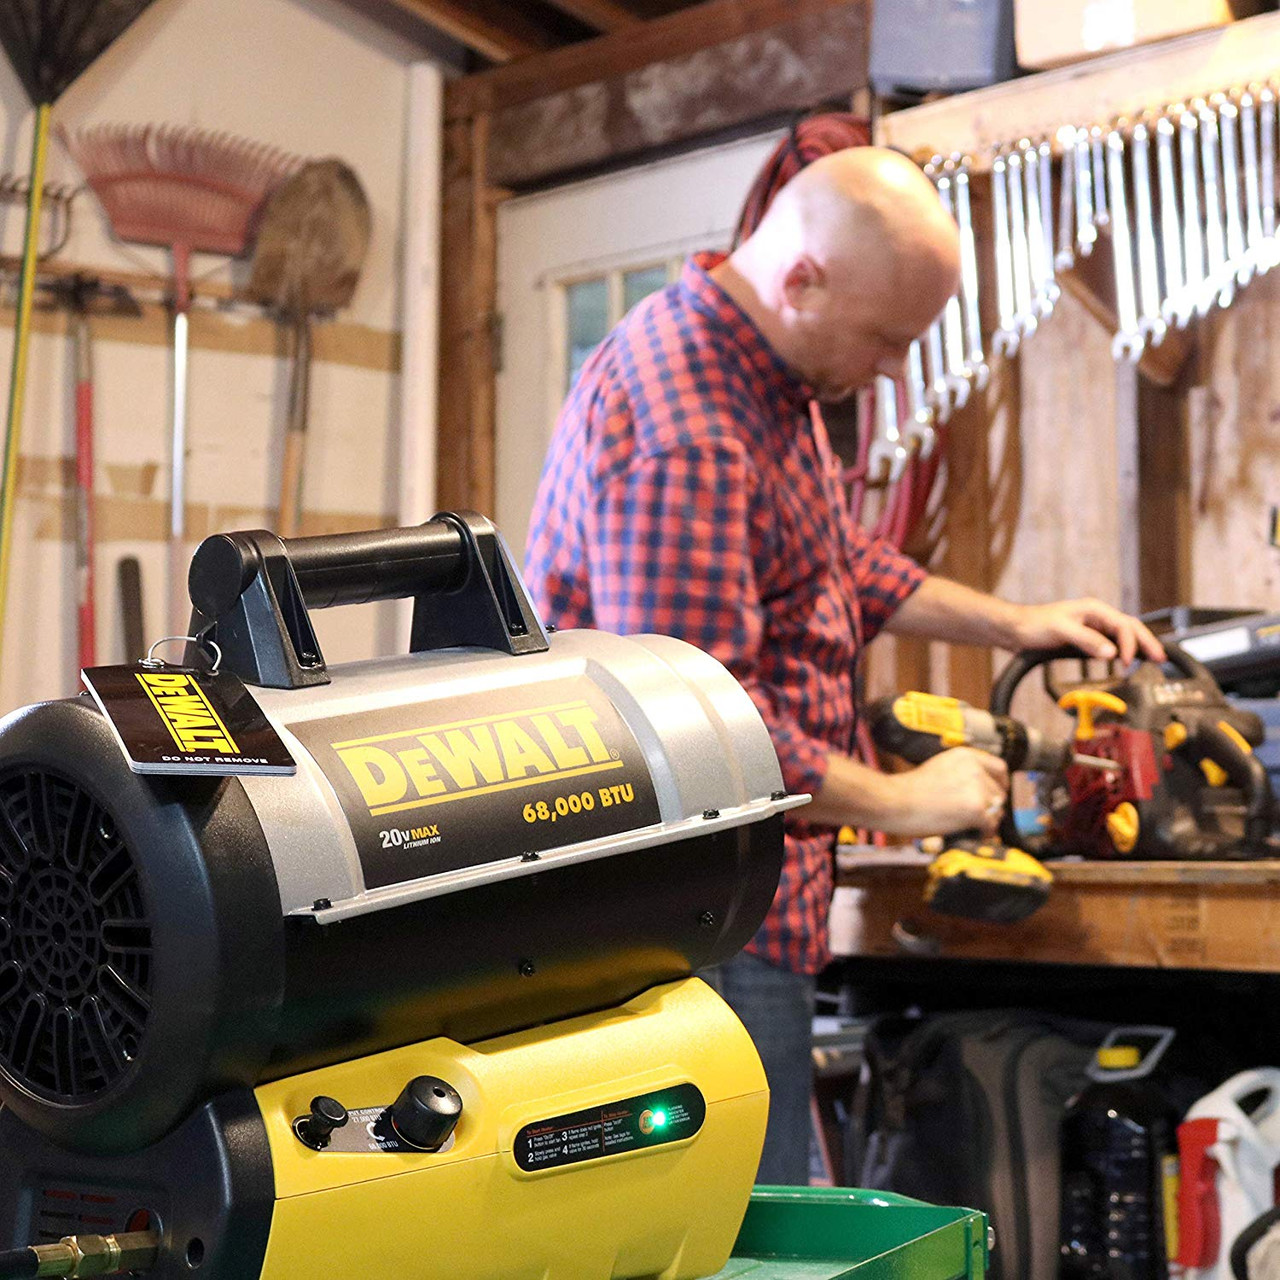 68,000 BTU DEWALT Cordless Propane Forced-Air Heater